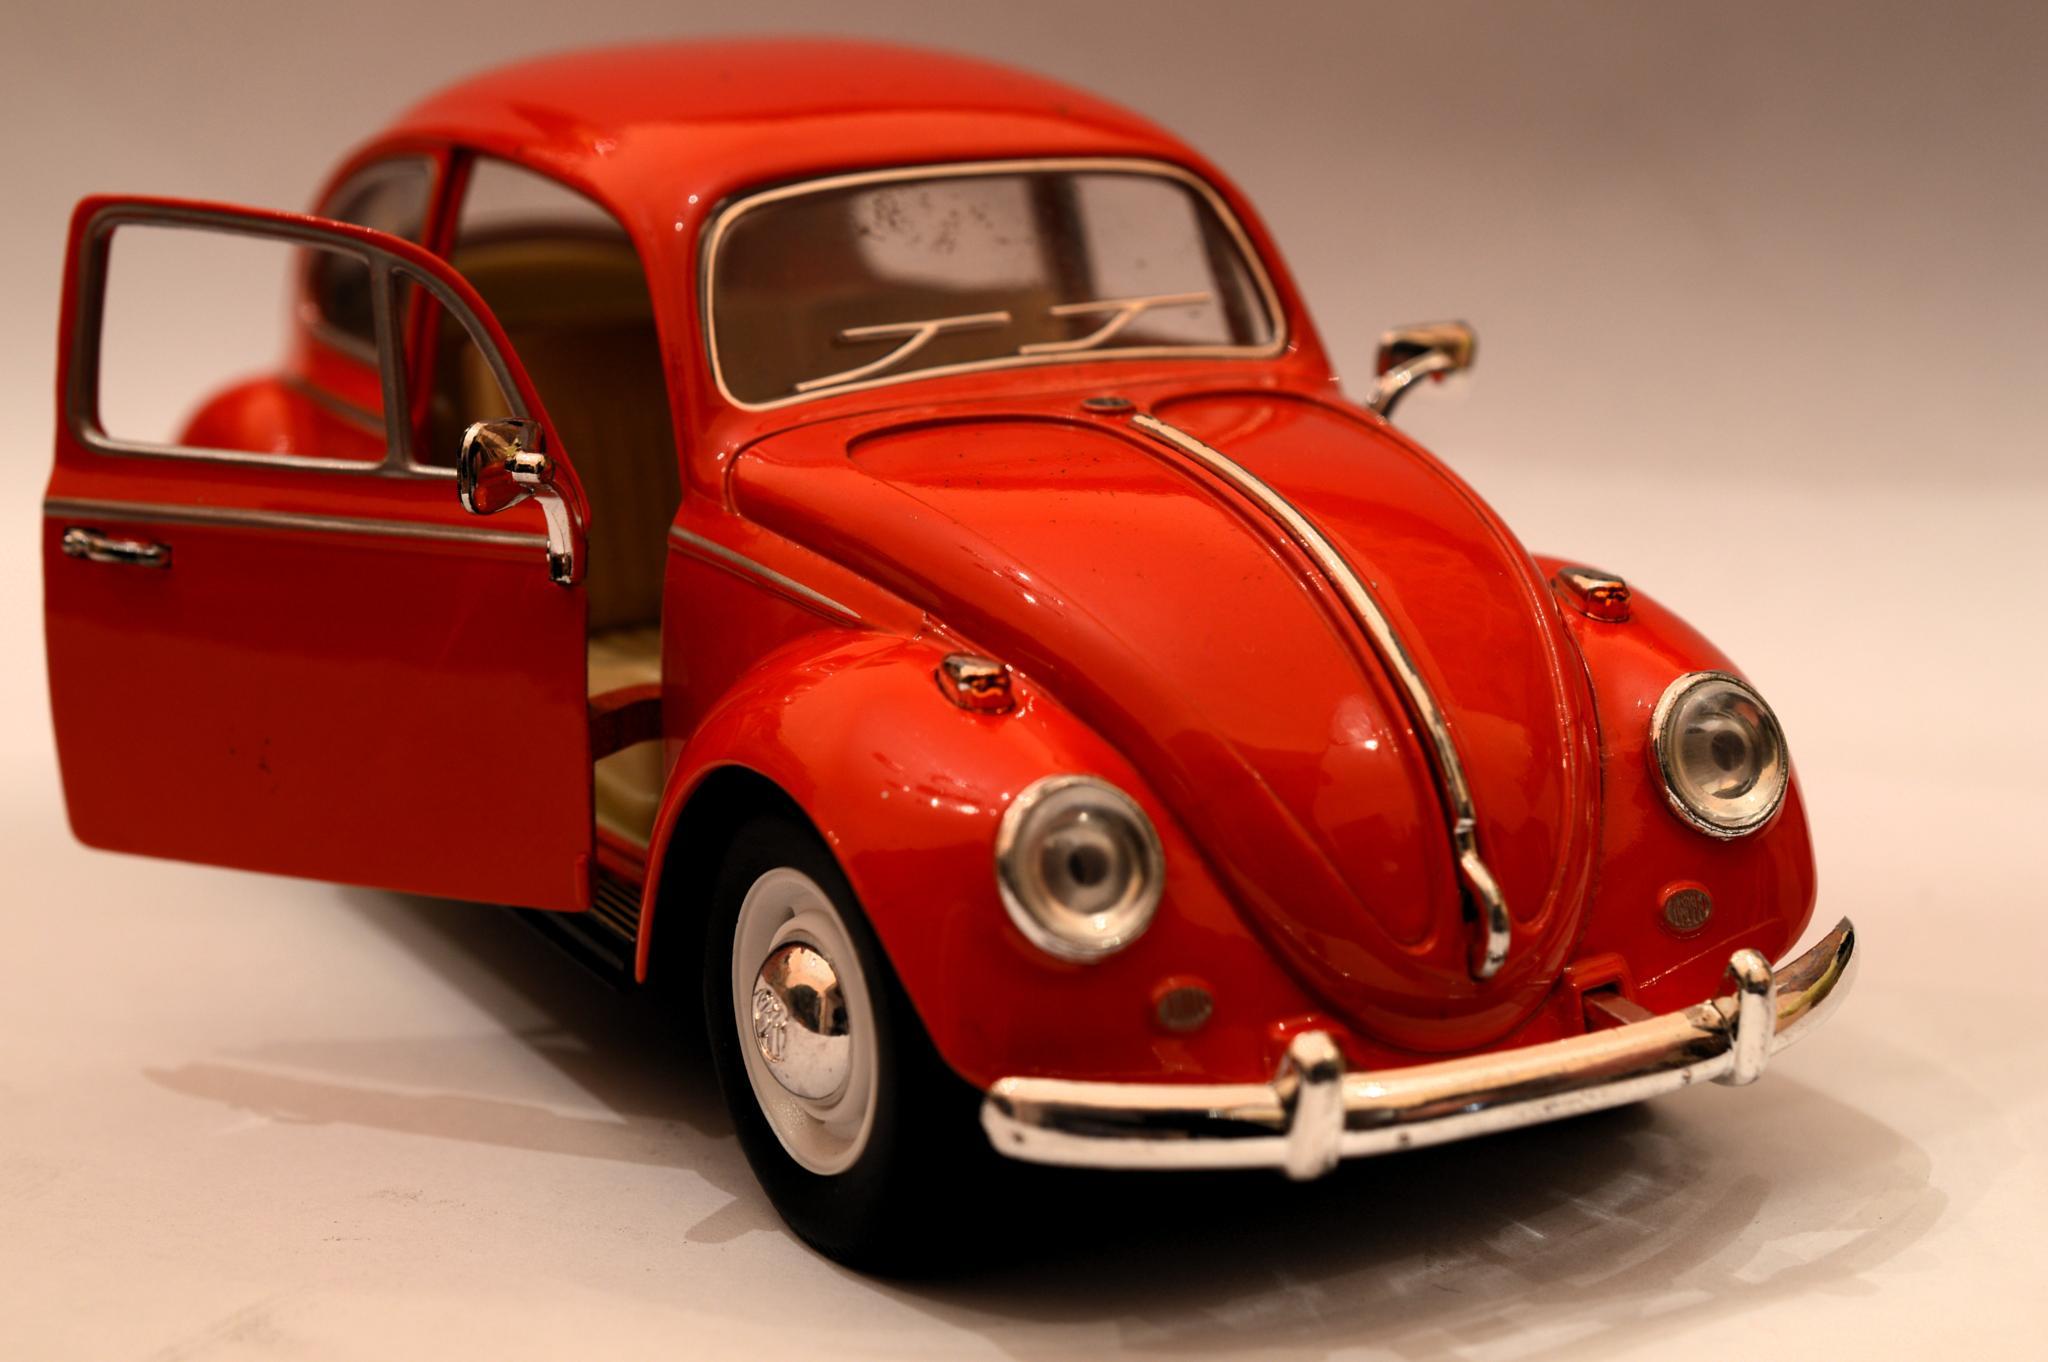 volkswagen beetle - escala 1/24 by Daniel Guillermo